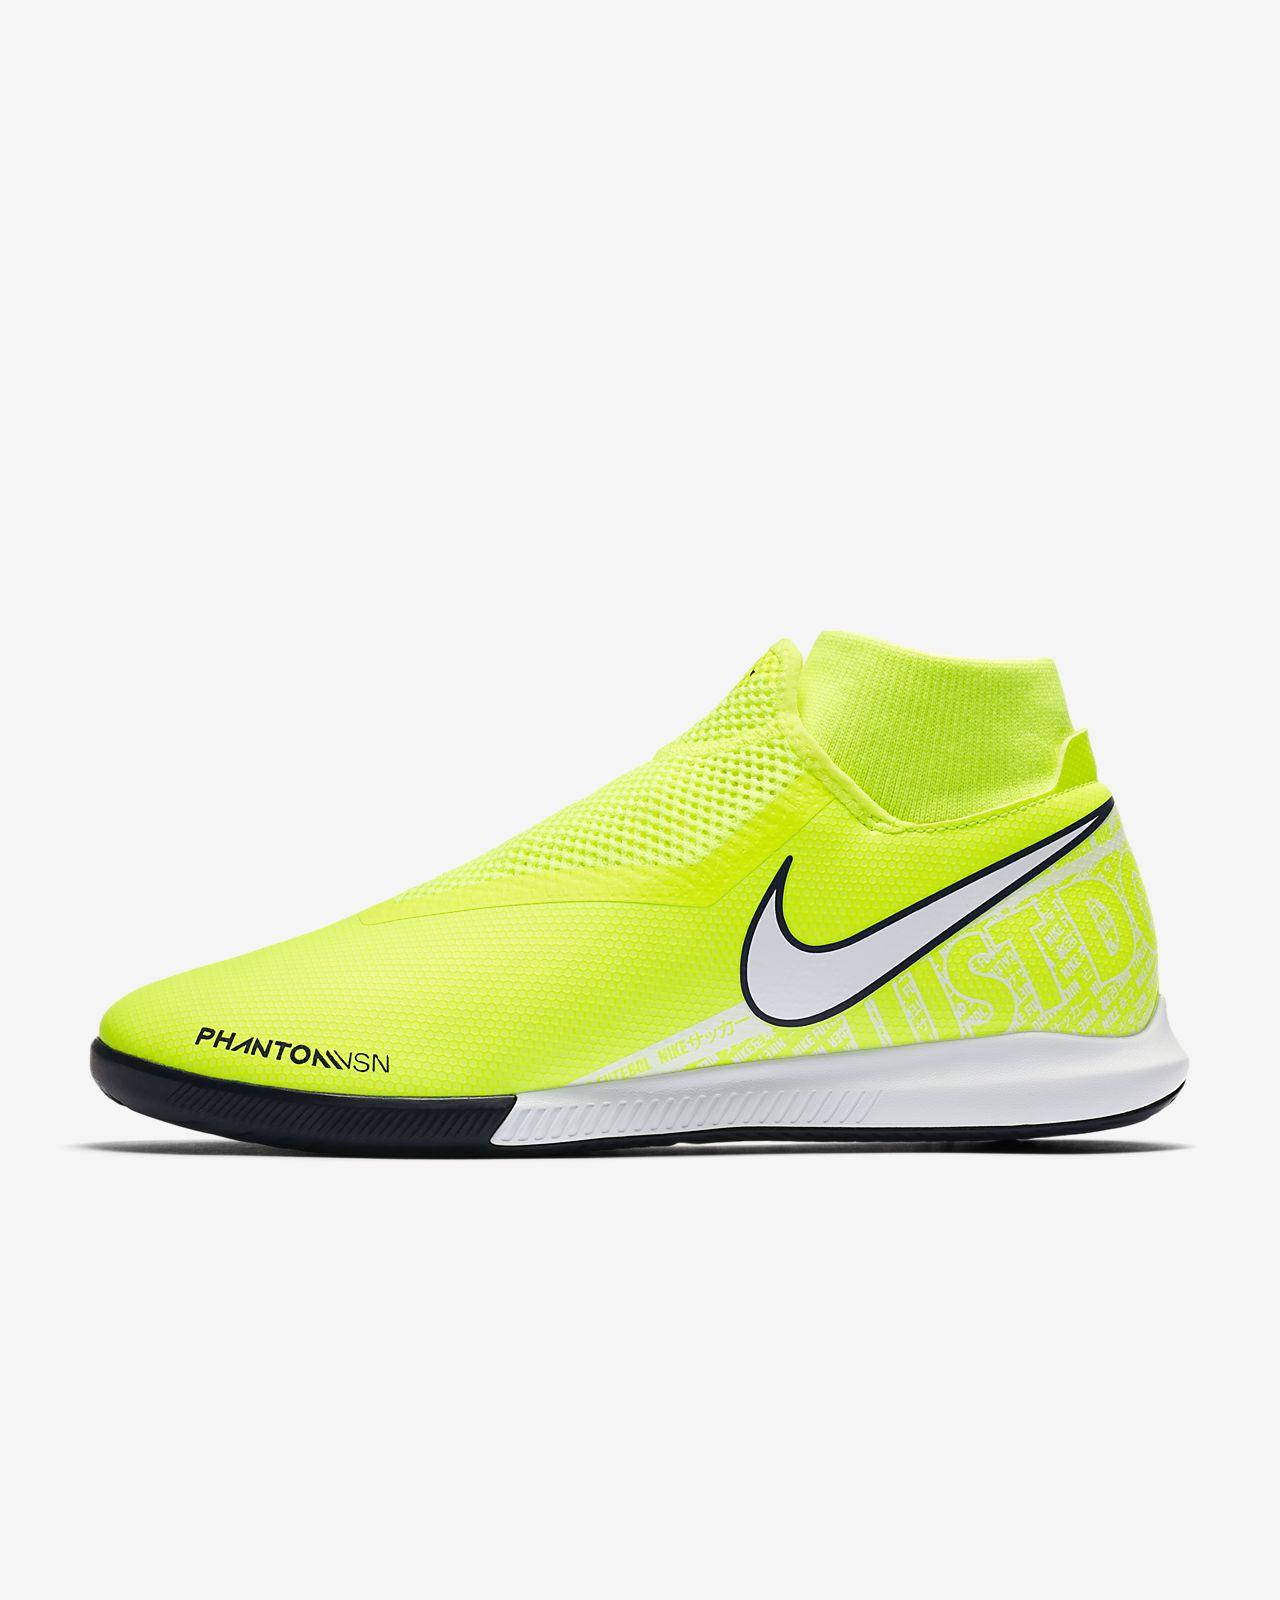 Sapatilhas de futsal Nike Phantom Vision Academy Dynamic Fit IC